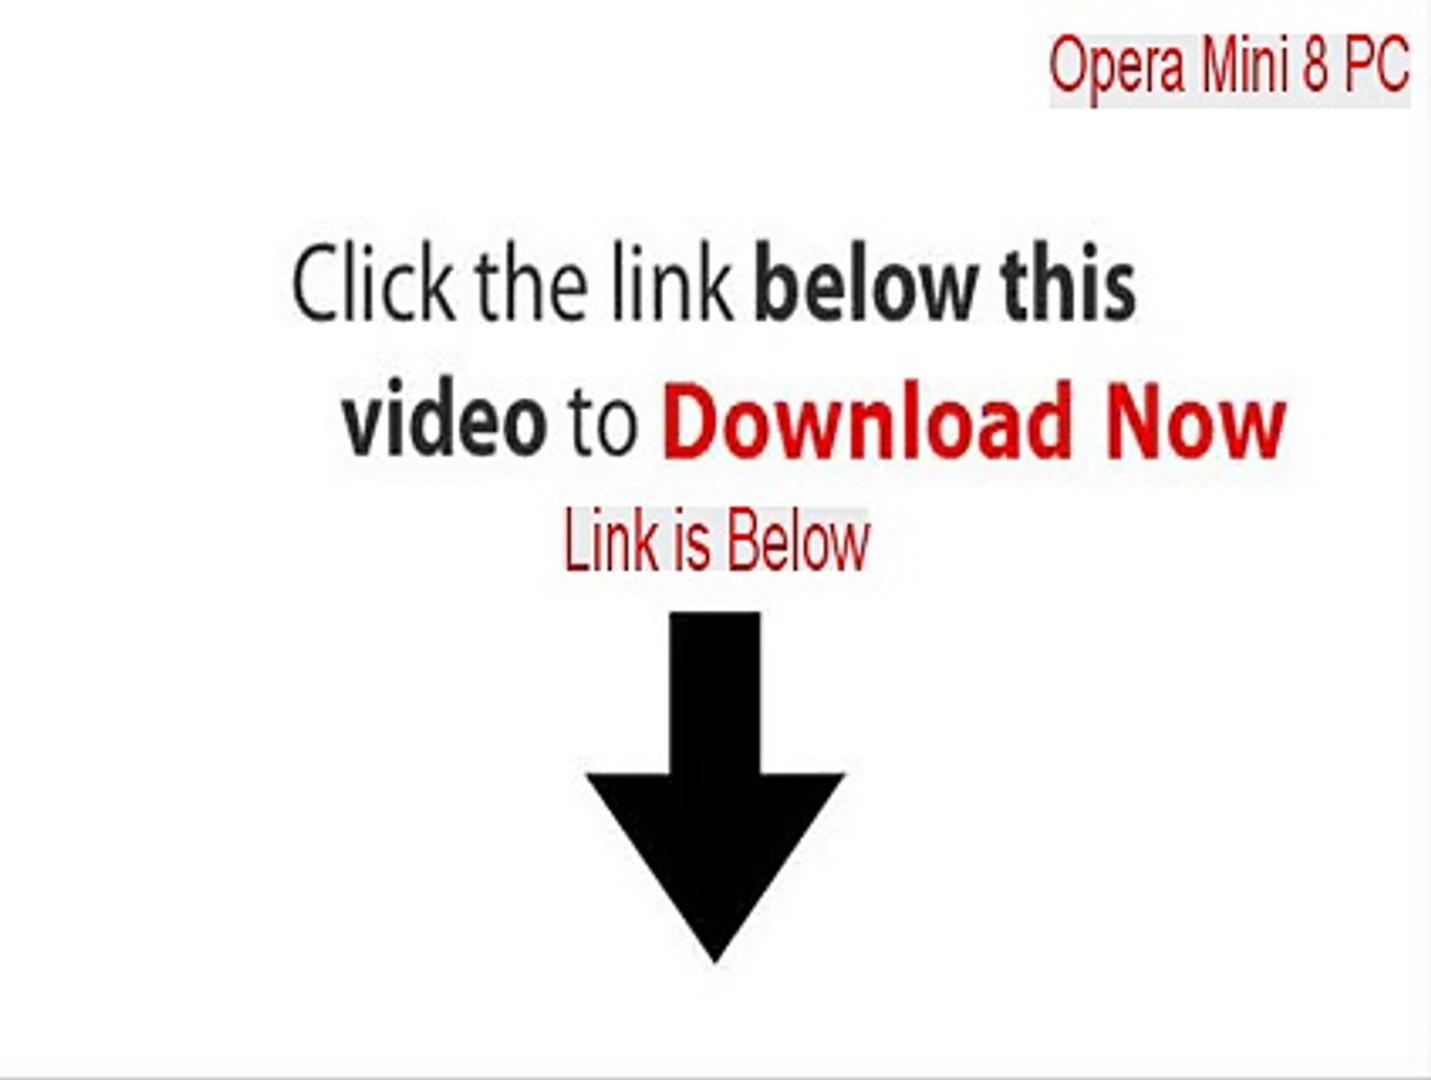 Opera Mini 8 PC Full - Instant Download